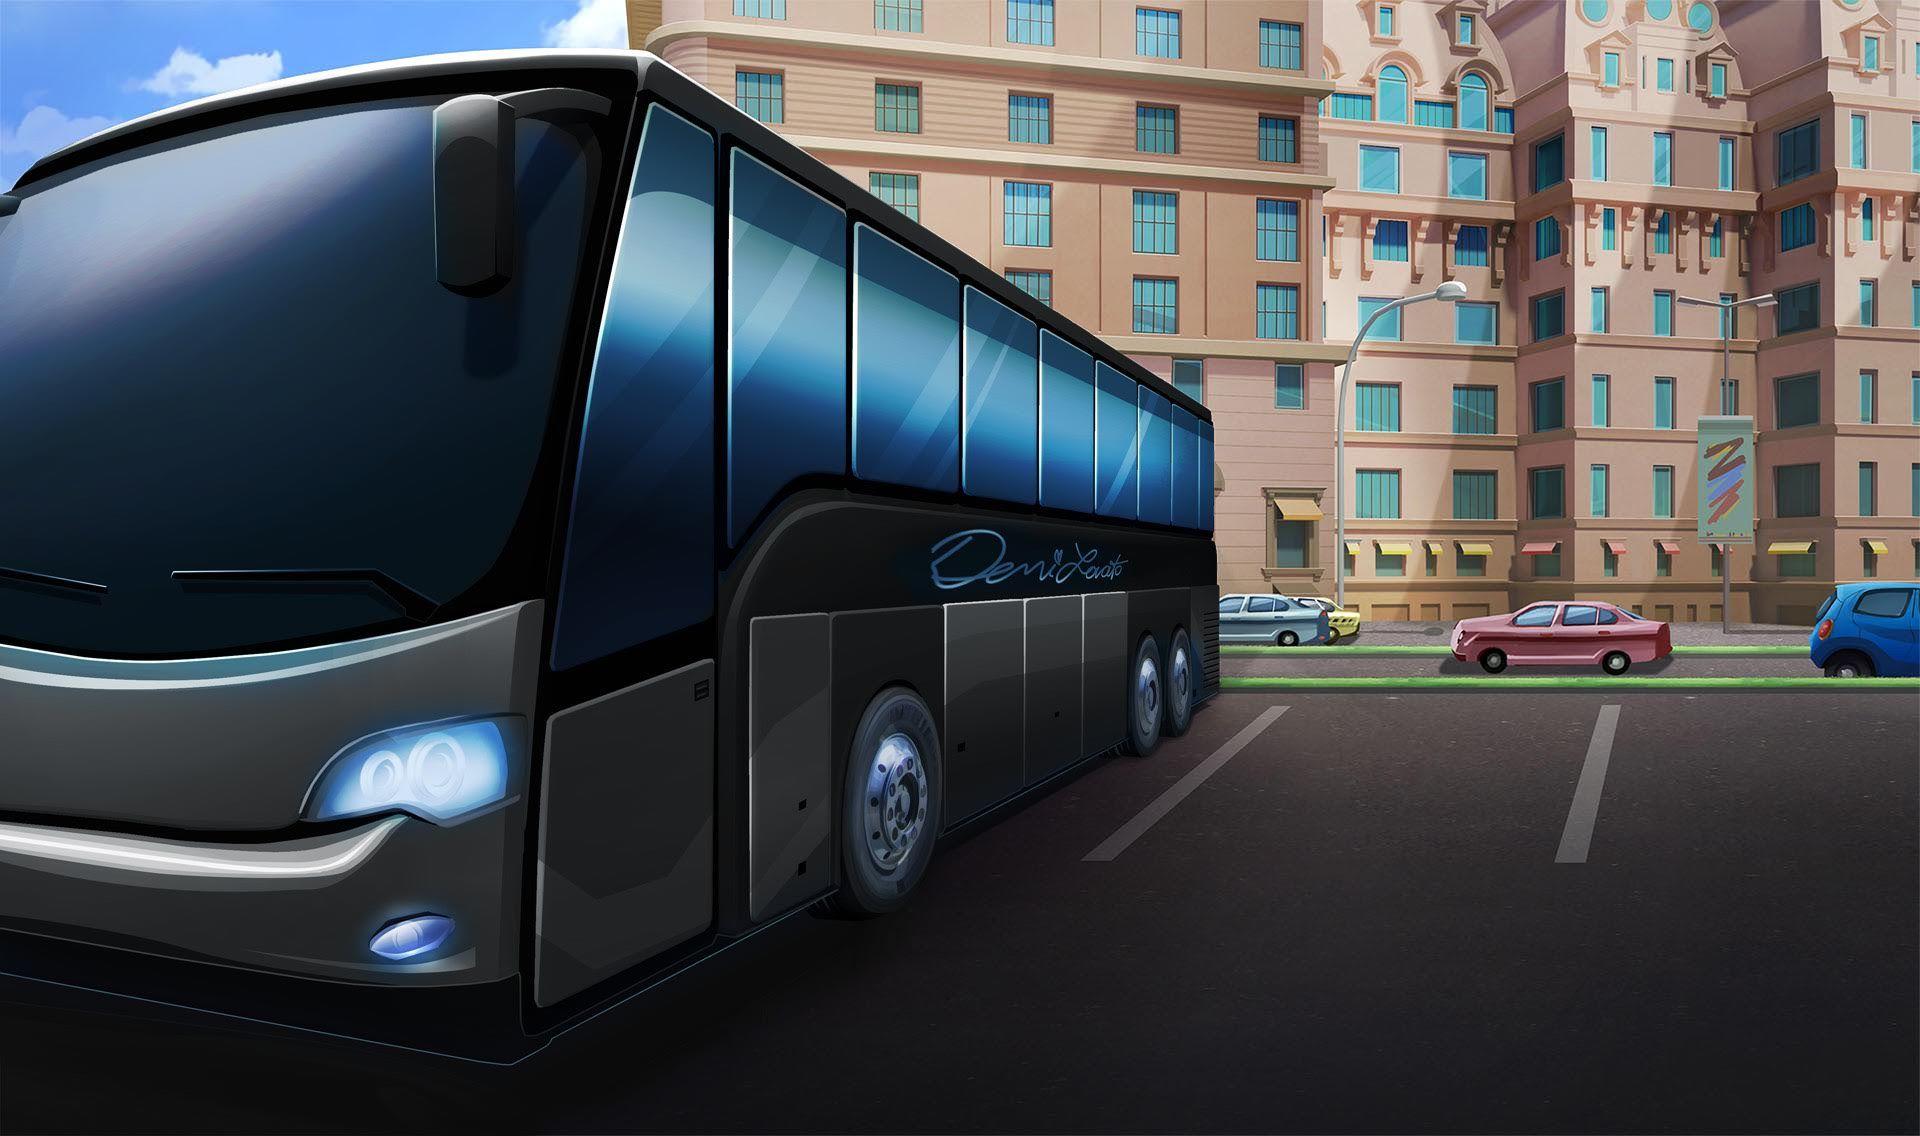 Ext Demi Tour Bus 2 Day Episode Backgrounds Episode